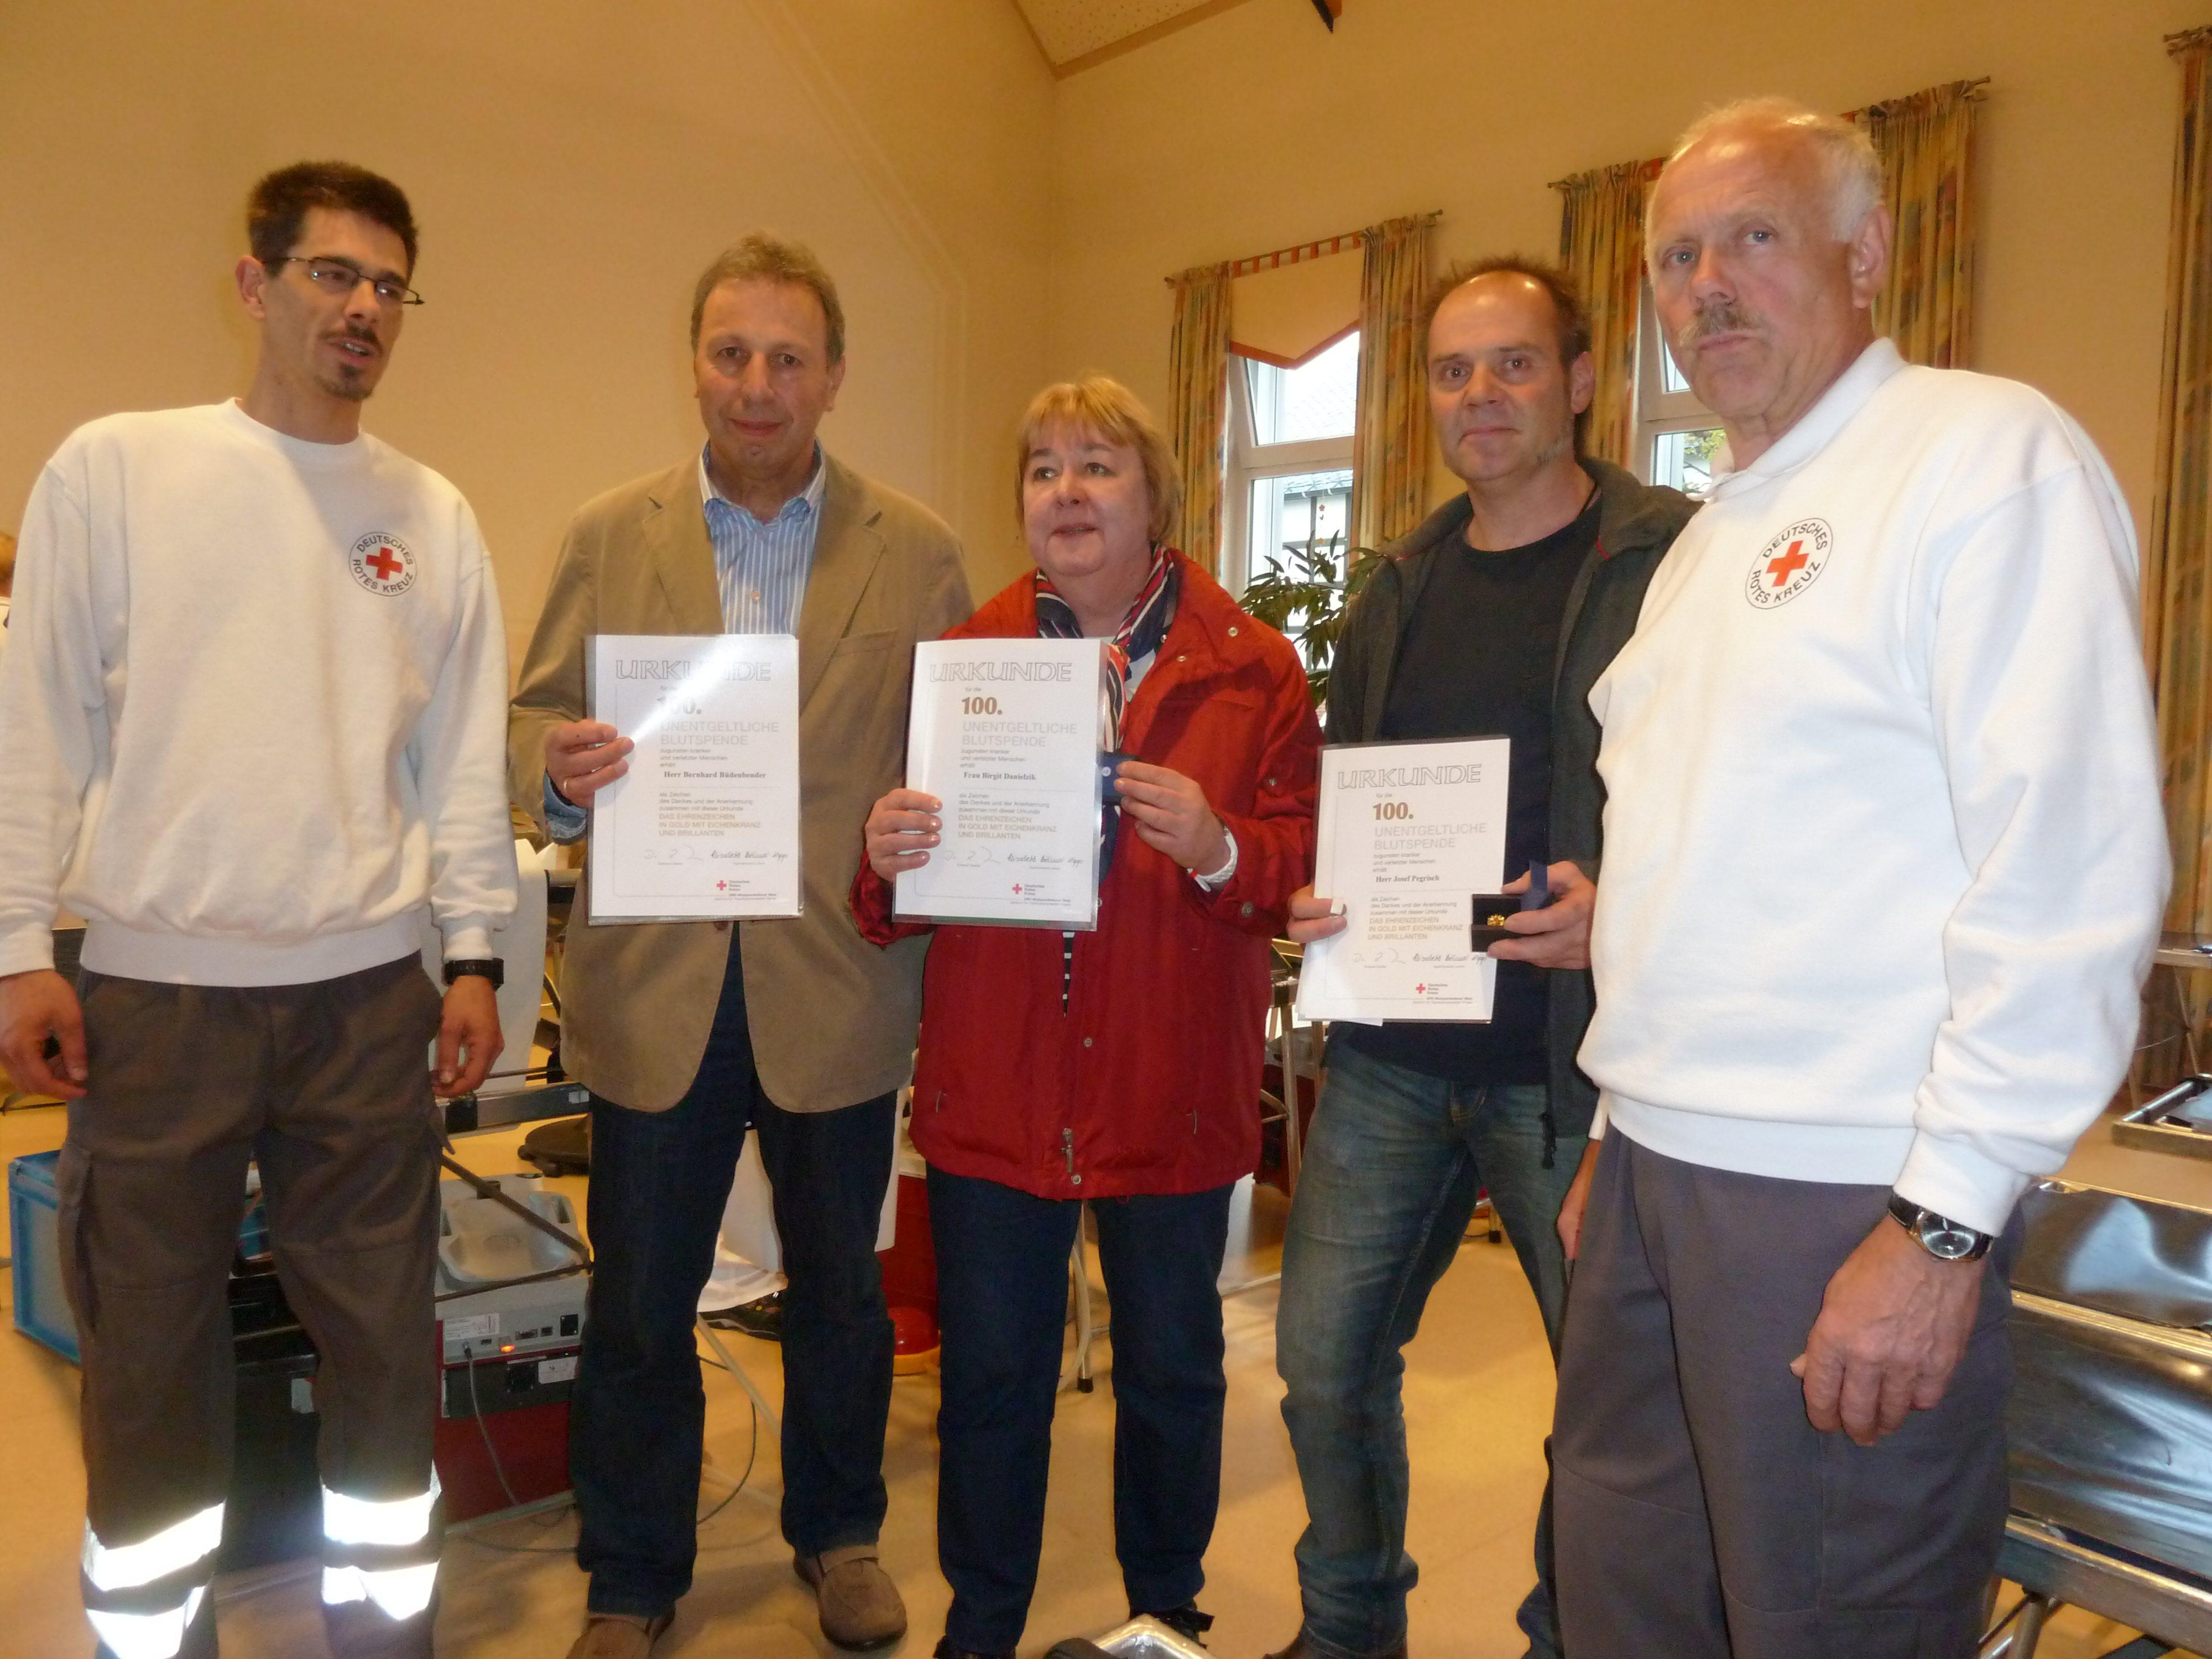 160 Blutspender kamen ins Haus Cäcilia